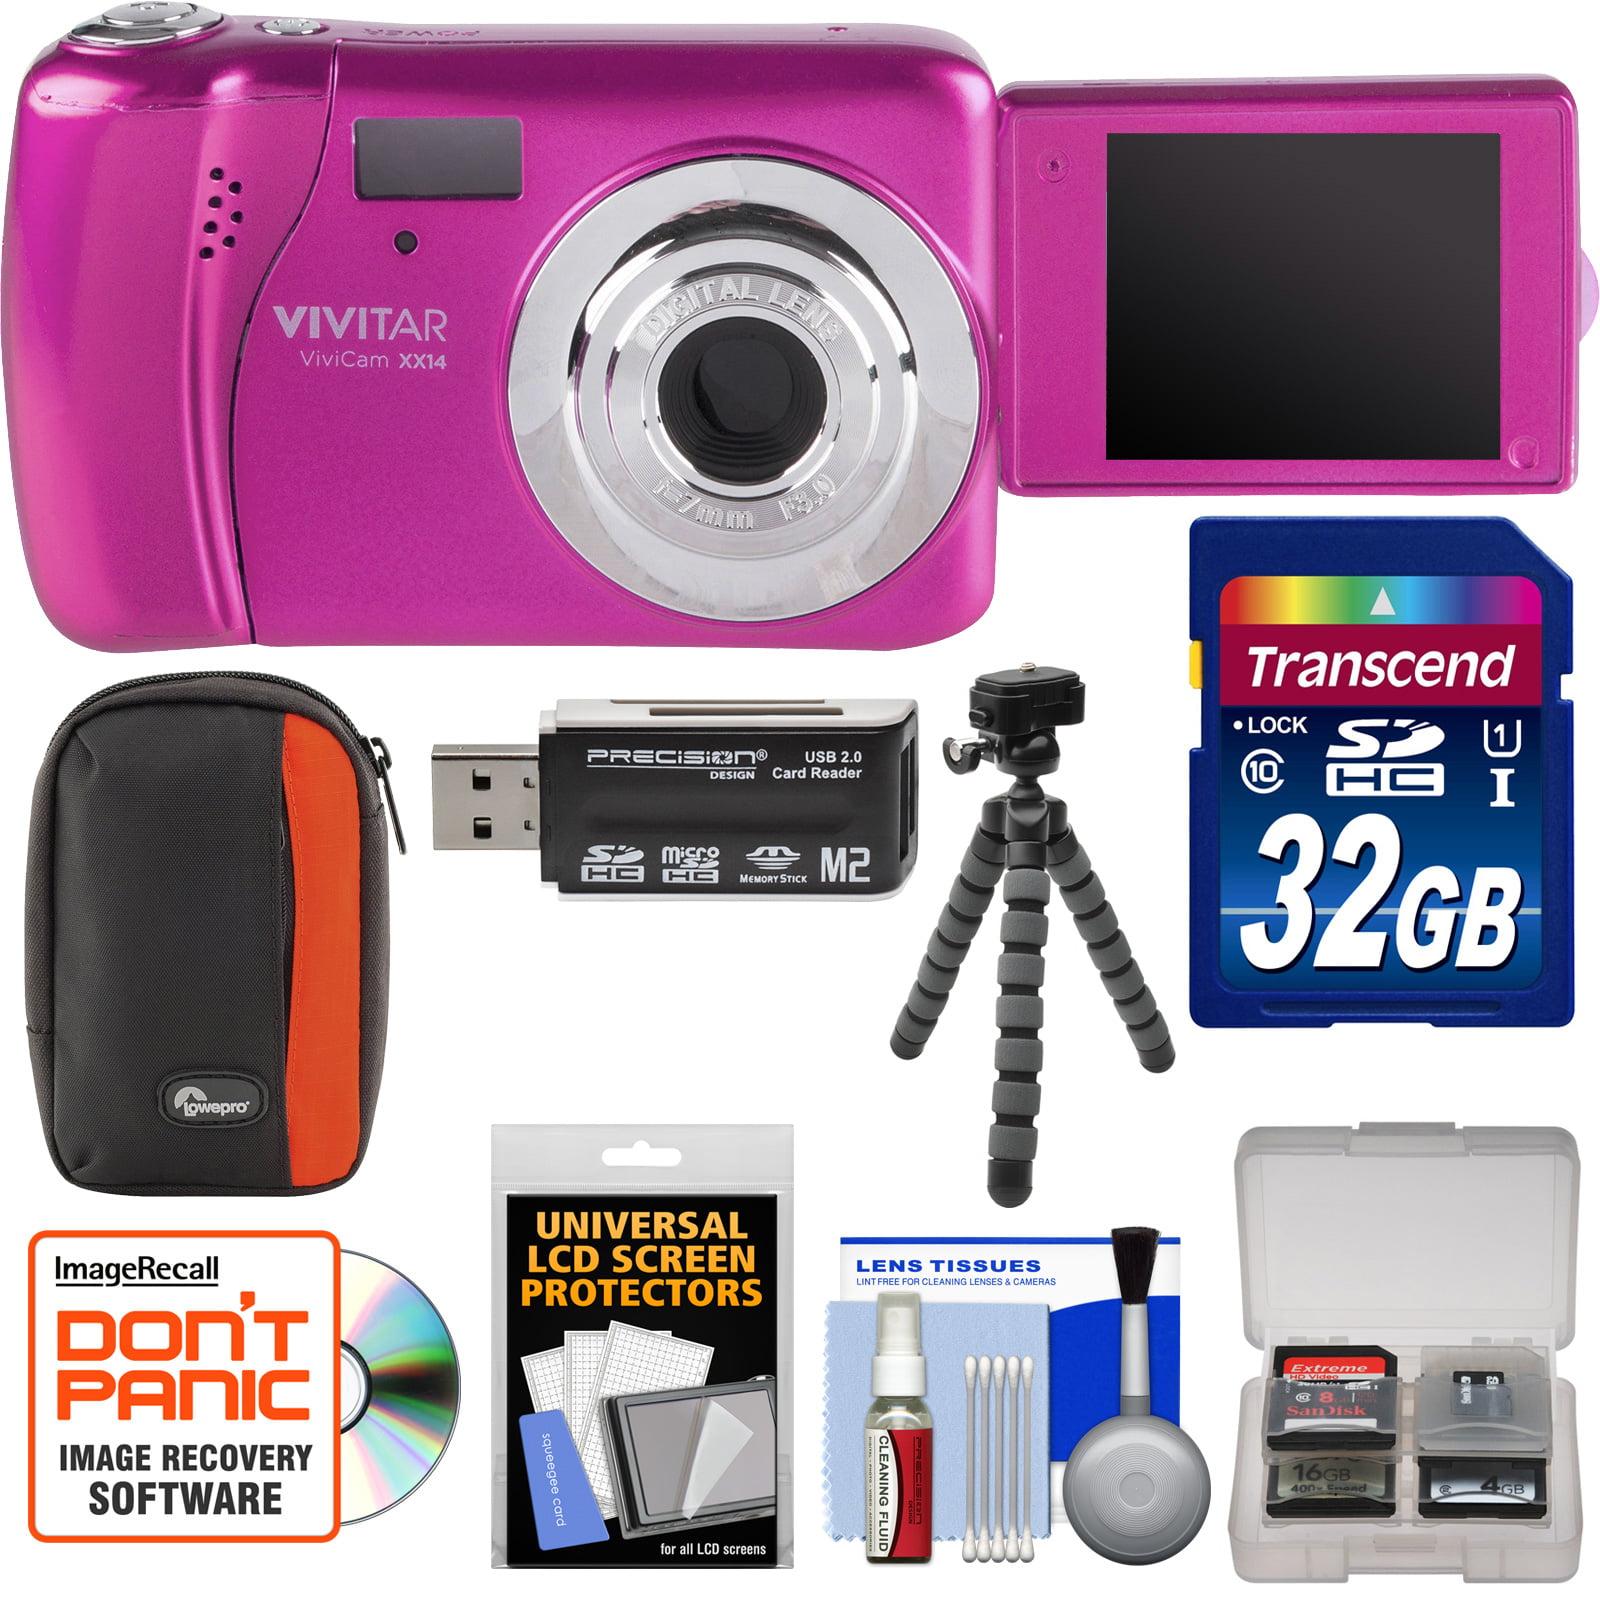 Vivitar ViviCam VXX14 Selfie Digital Camera (Pink) with 32GB Card + Case + Flex Tripod + Reader + Kit